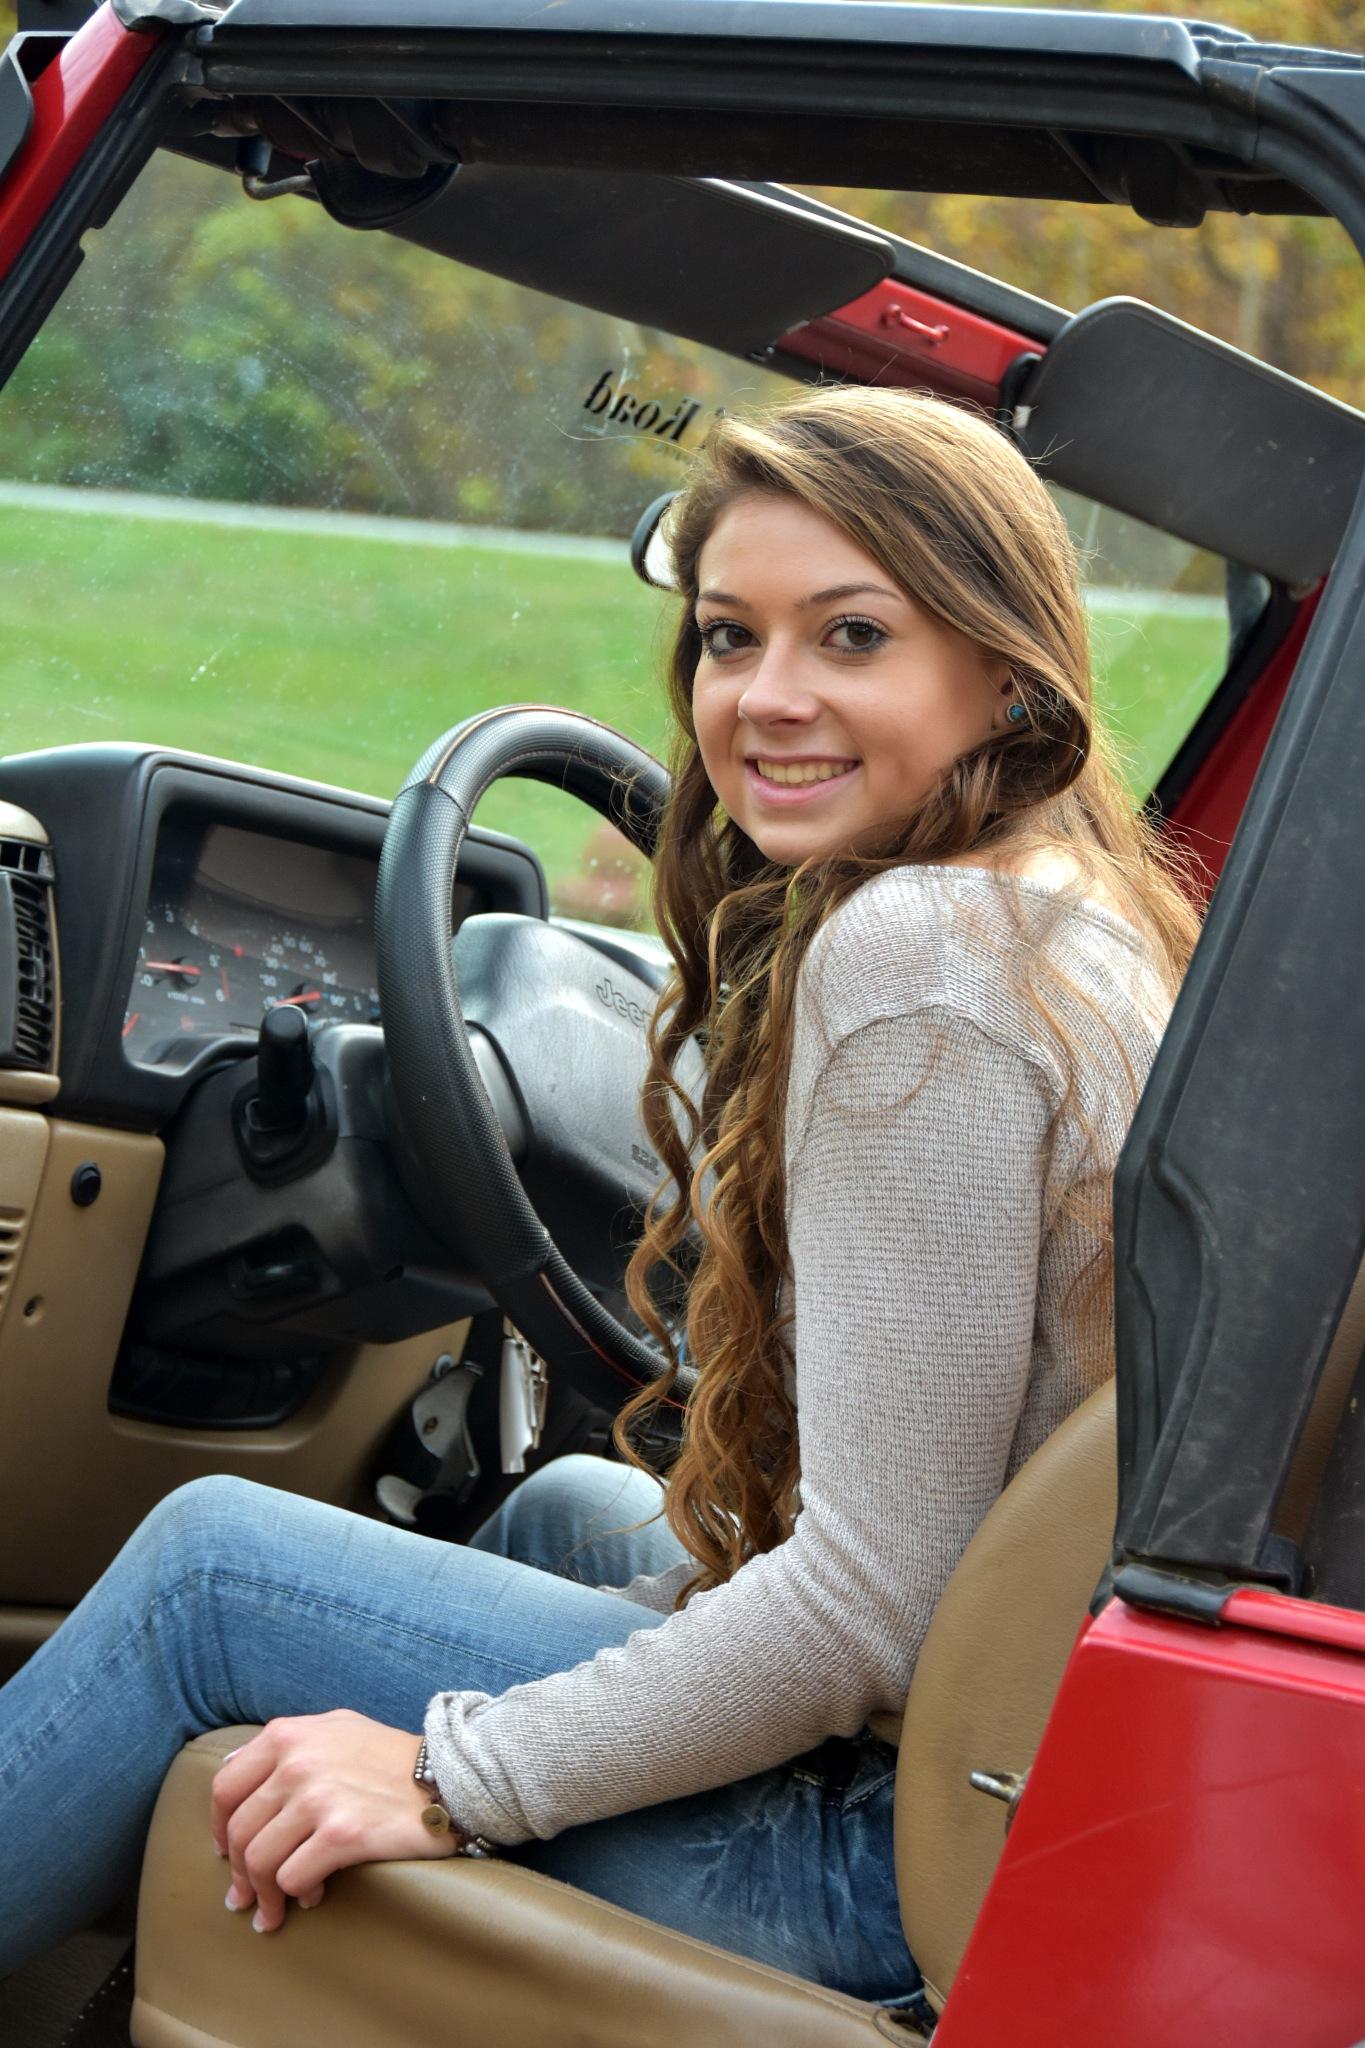 jeep girly by Angie Peters Reszinski